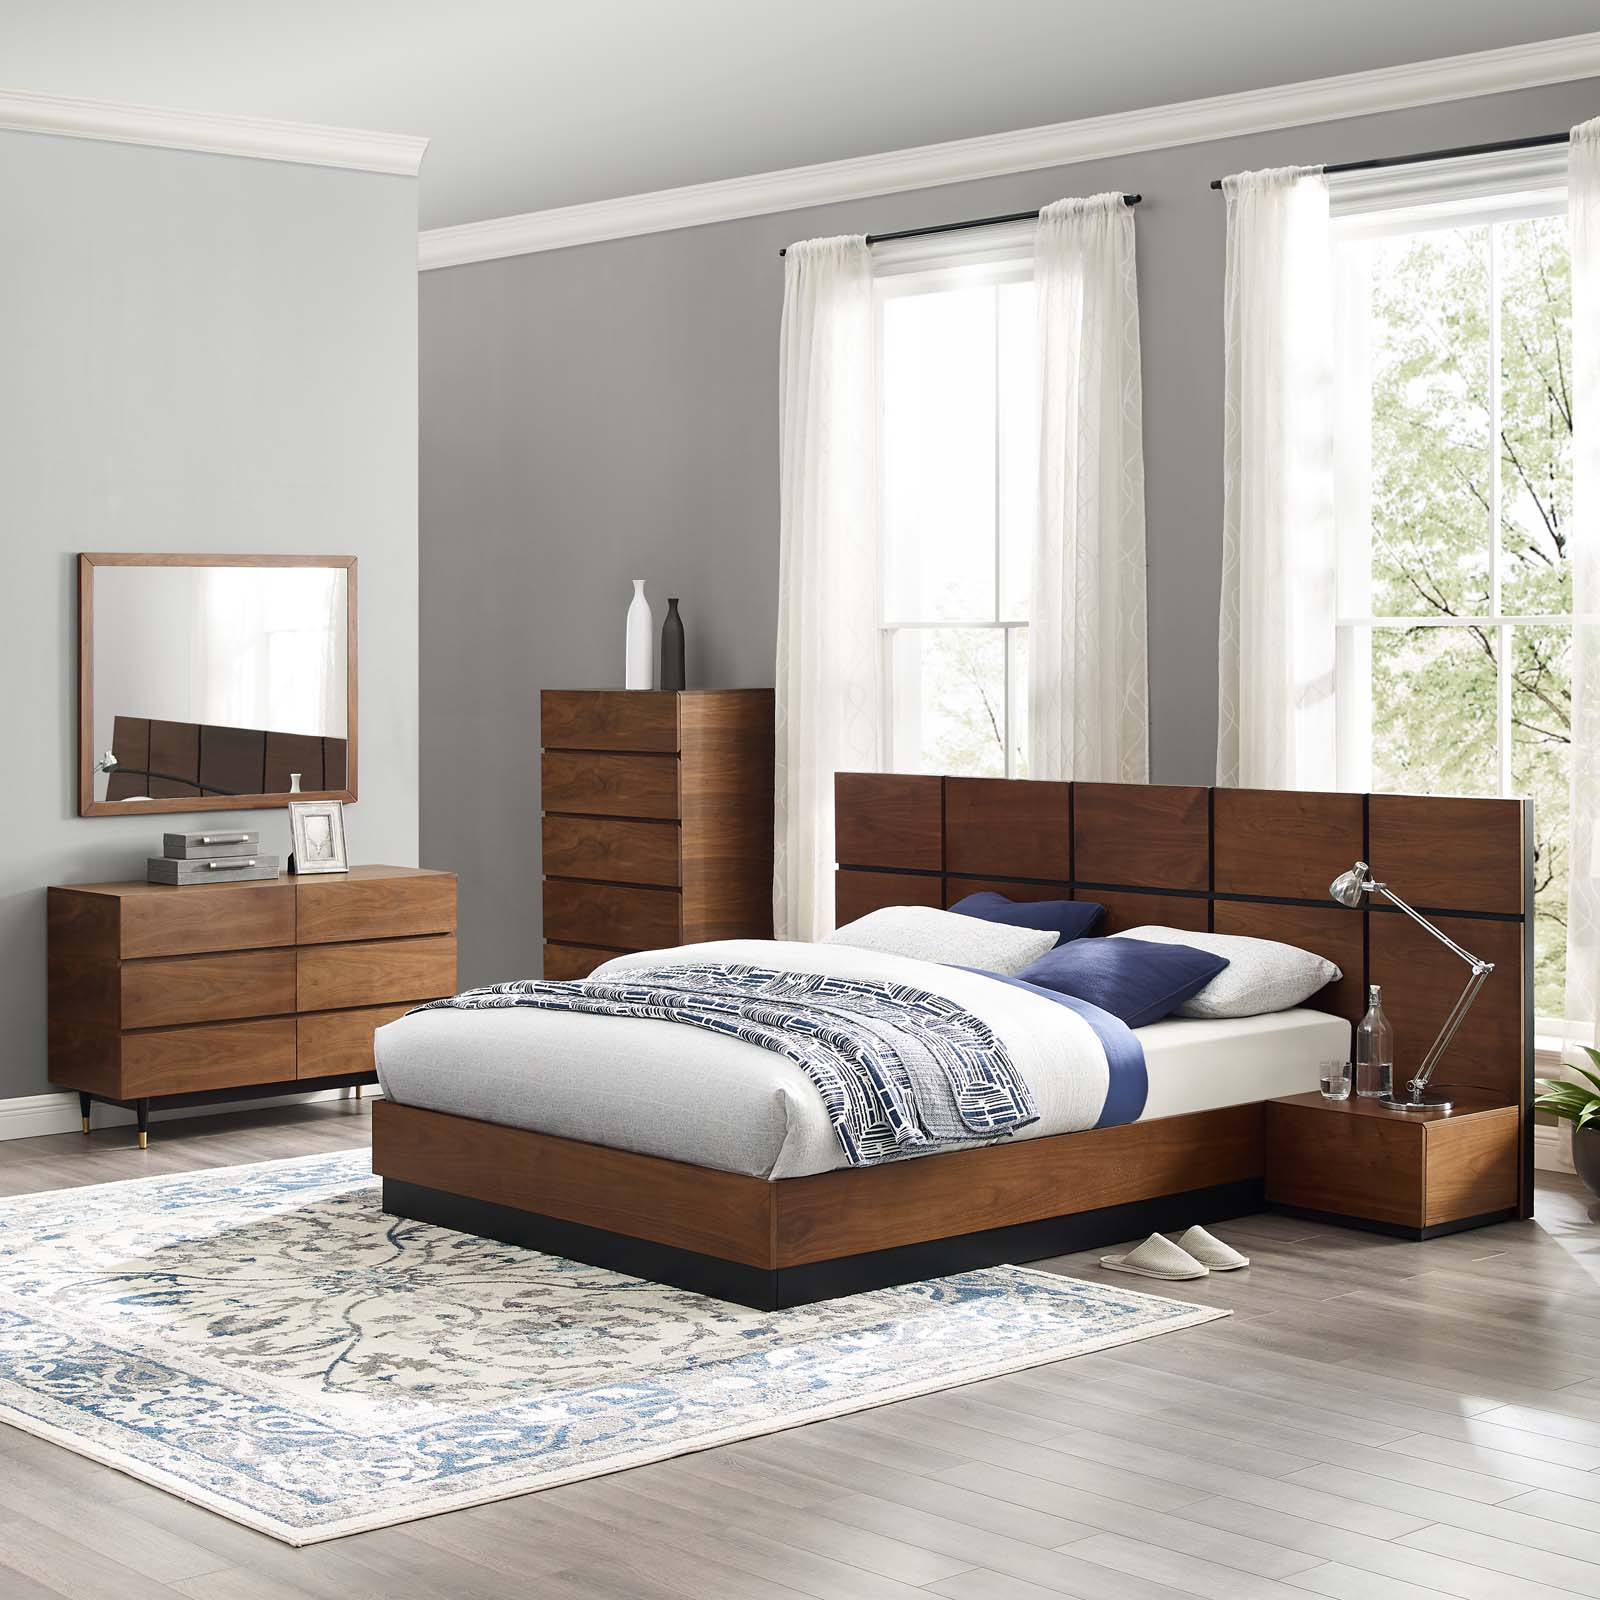 caima 6piece bedroom set walnut